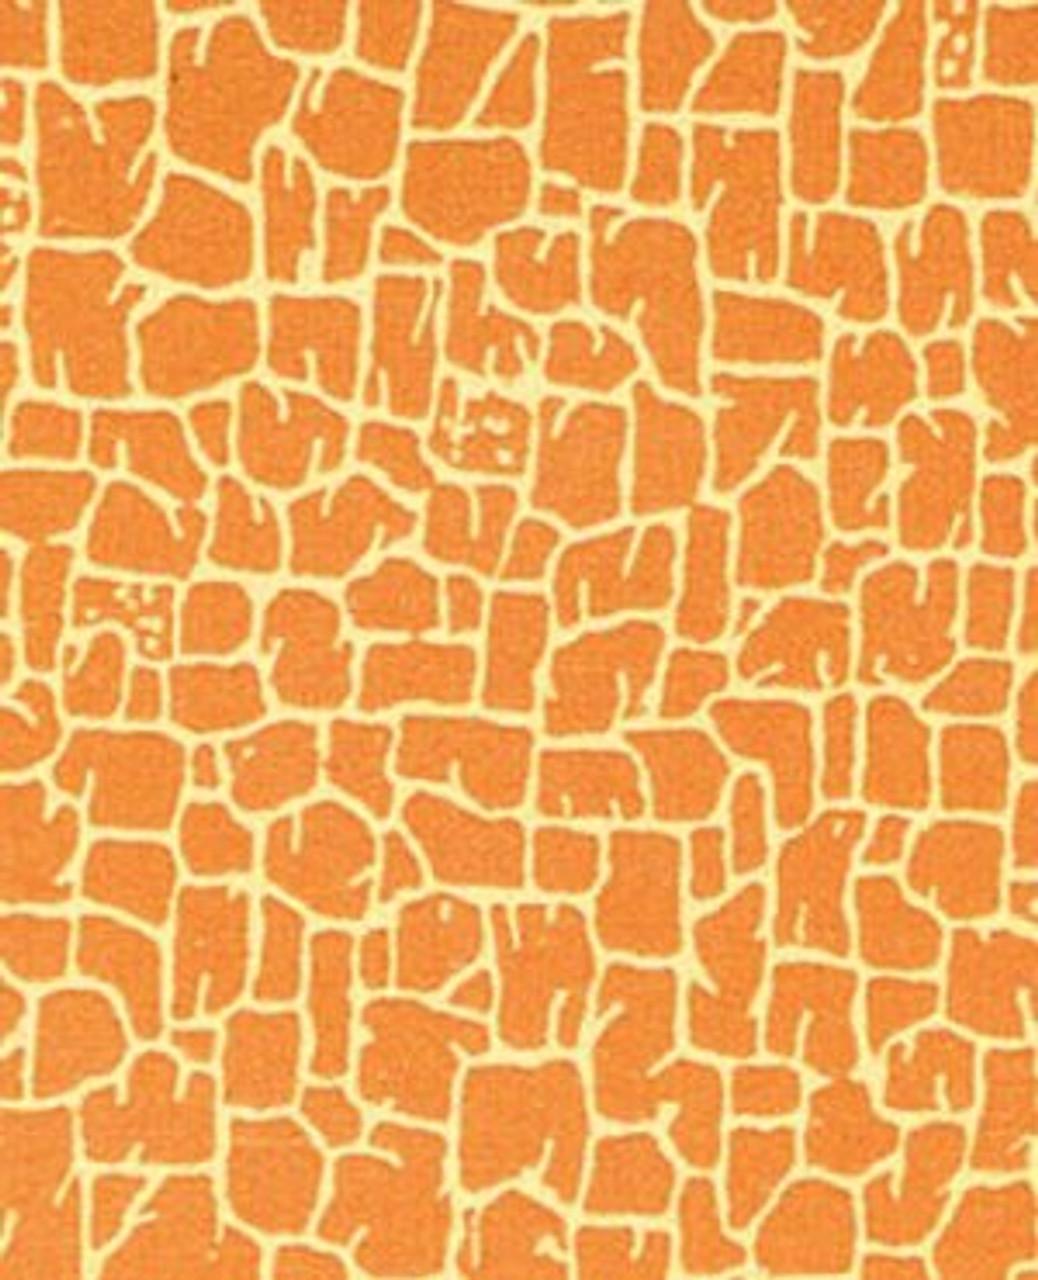 Brown Rubble Stone Facing Paper